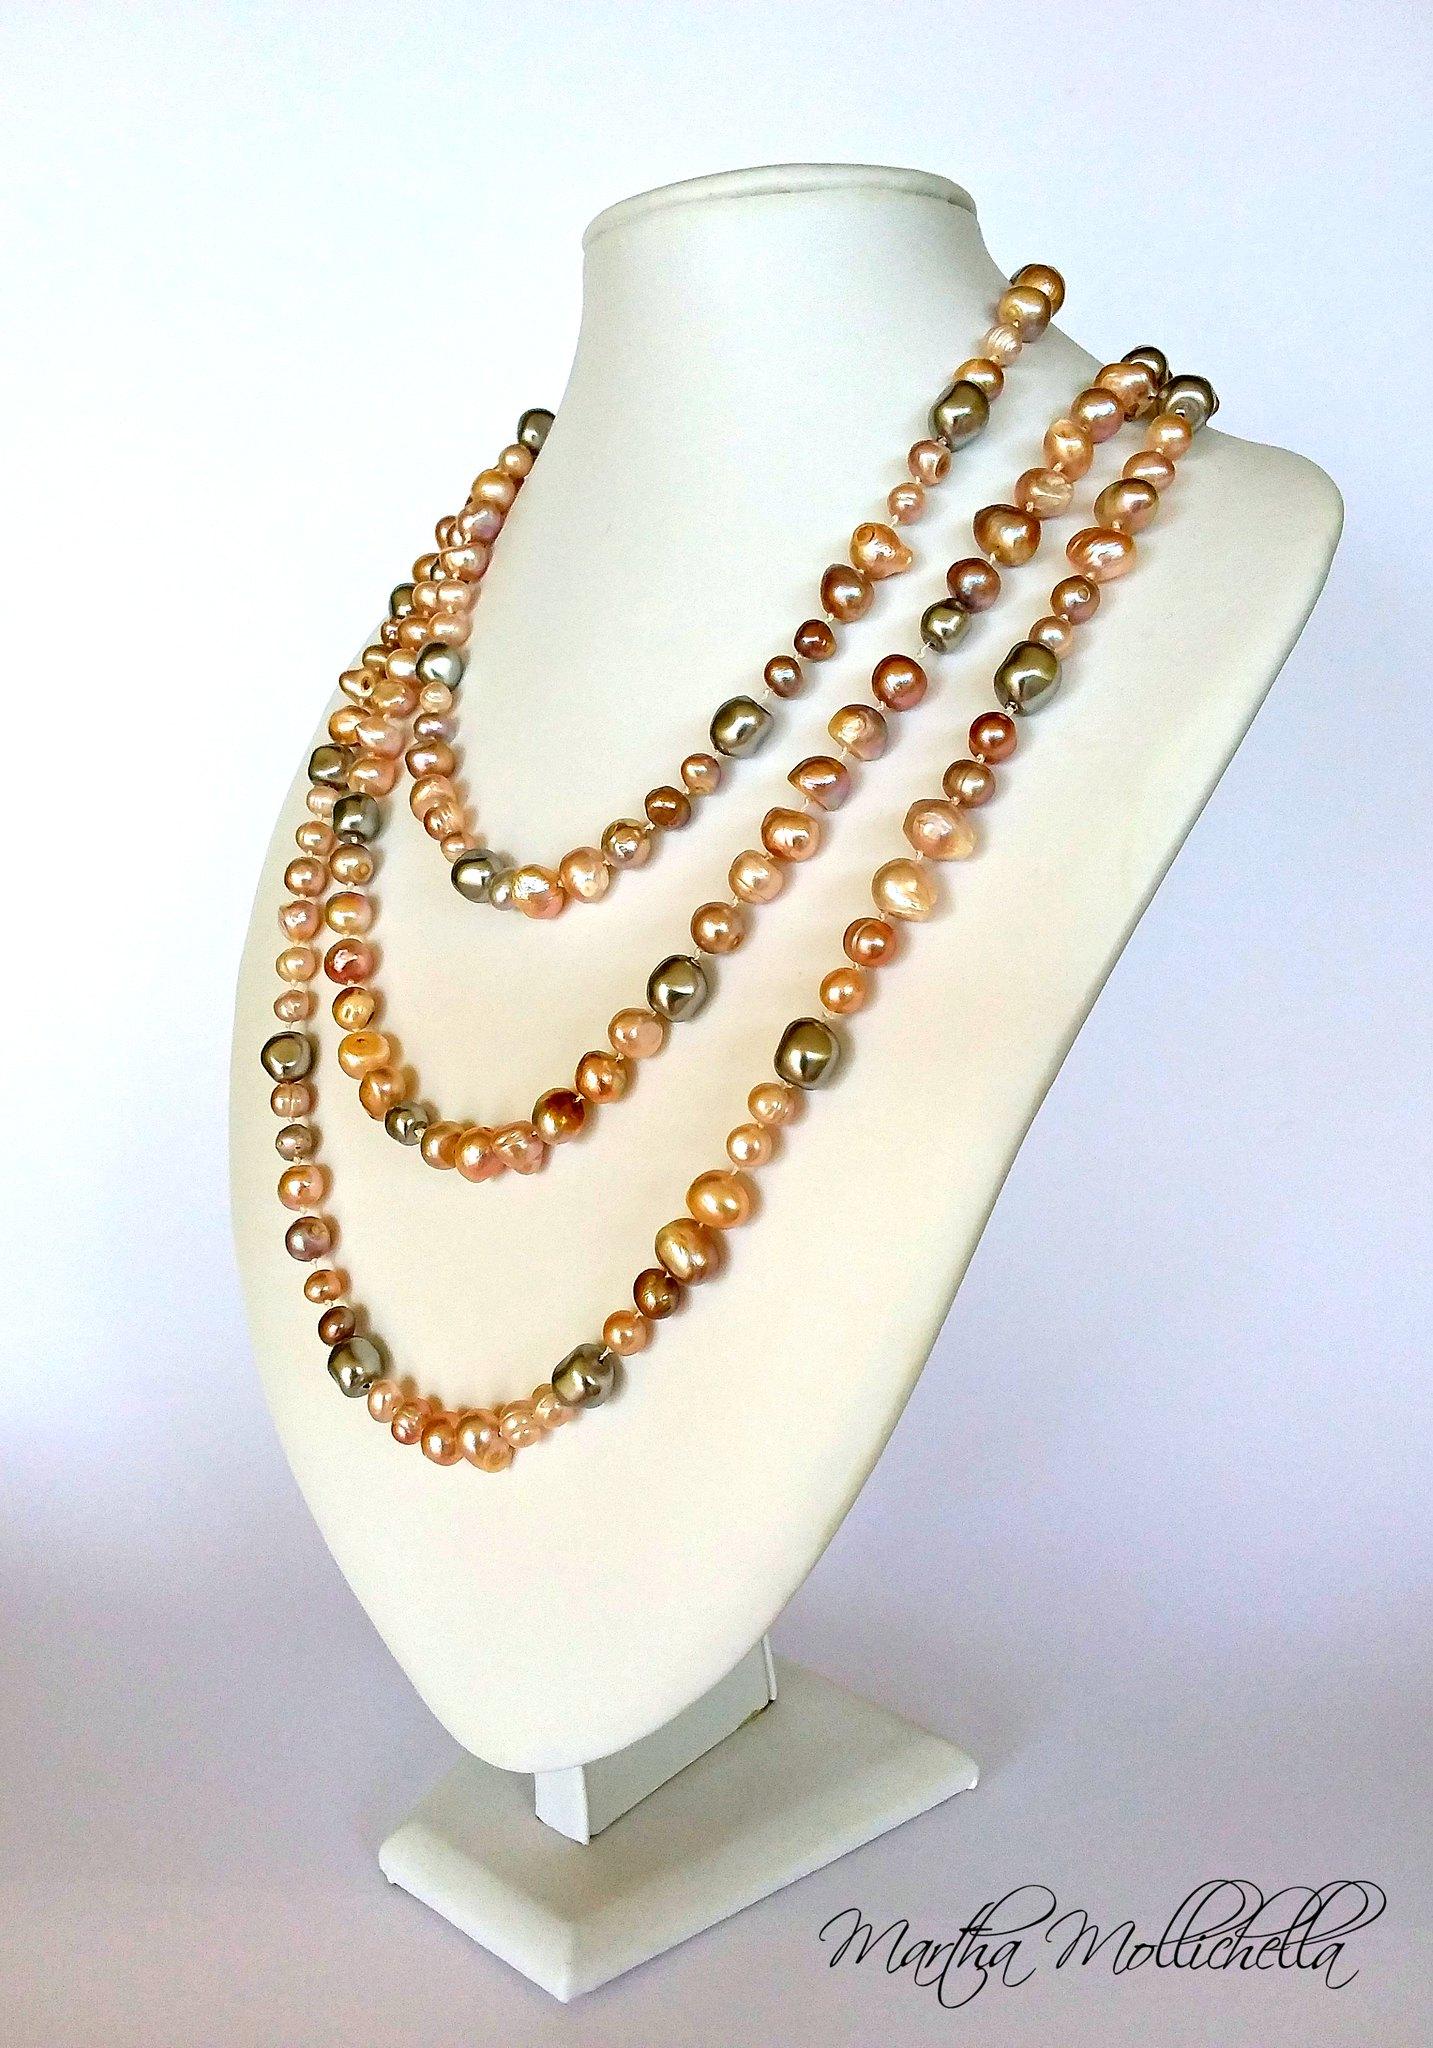 Freshwater pearls swarovski baroque pearls